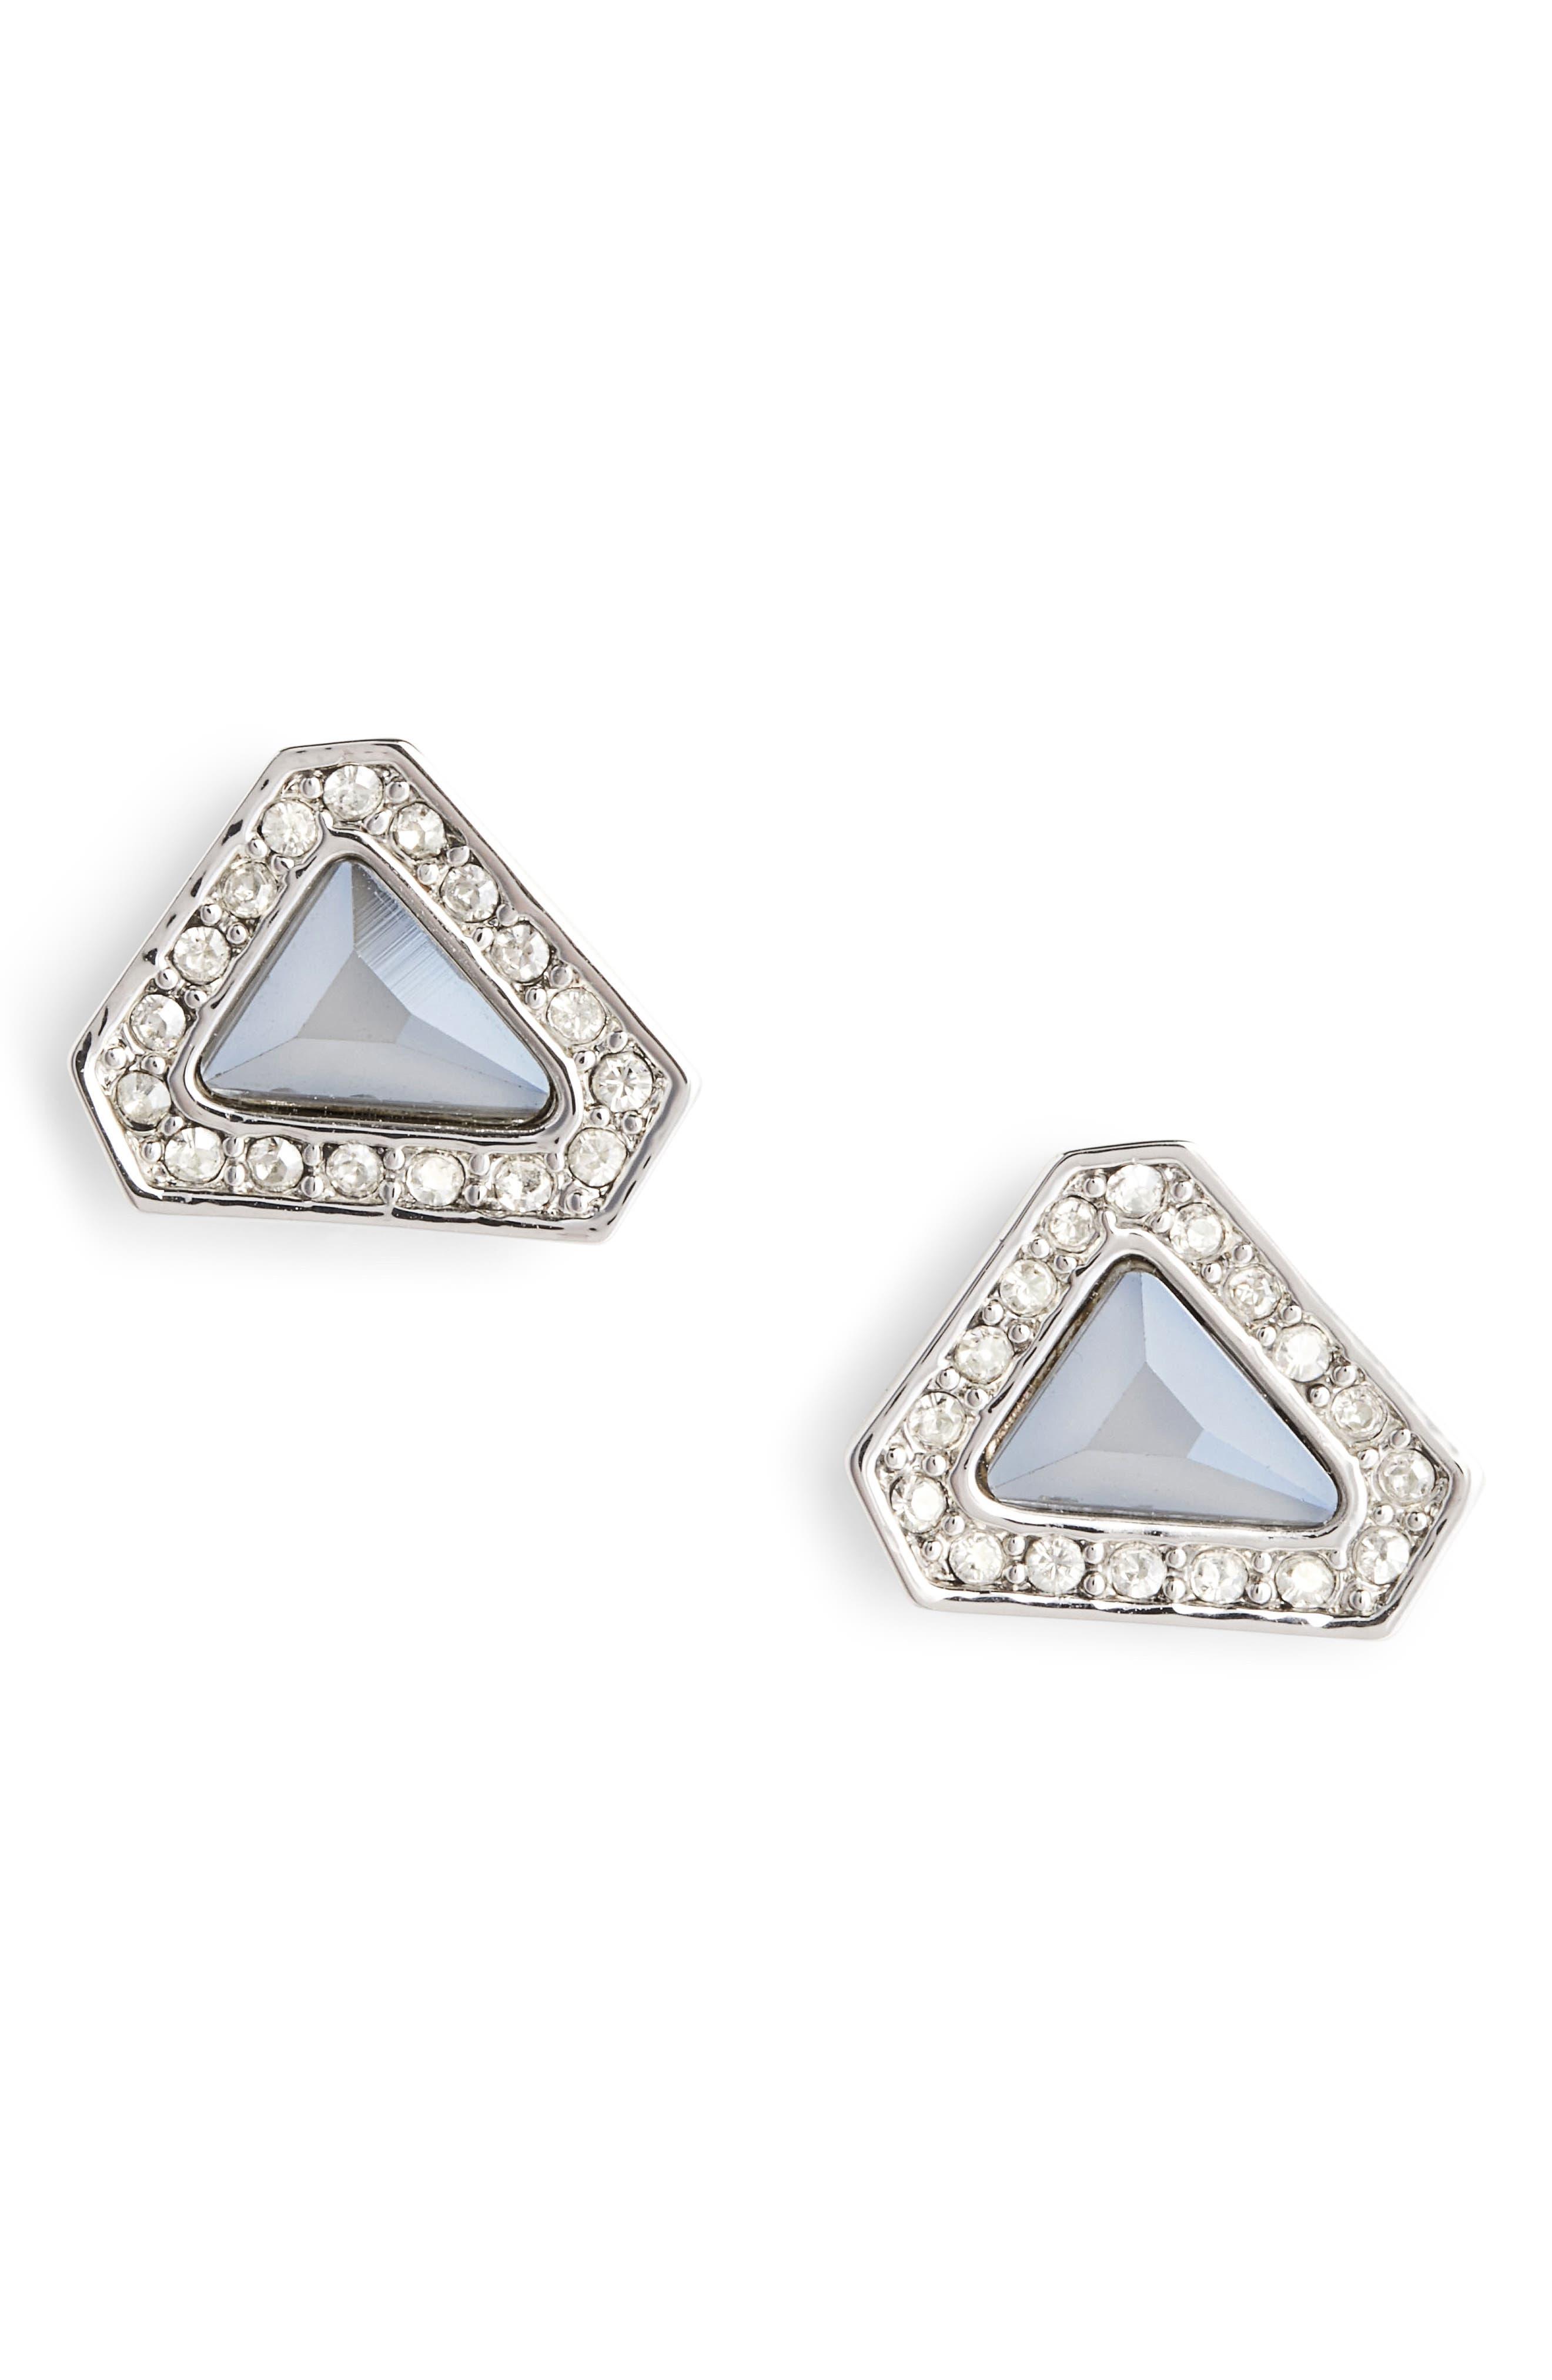 Swarovski Crystal Stud Earrings,                             Main thumbnail 1, color,                             020